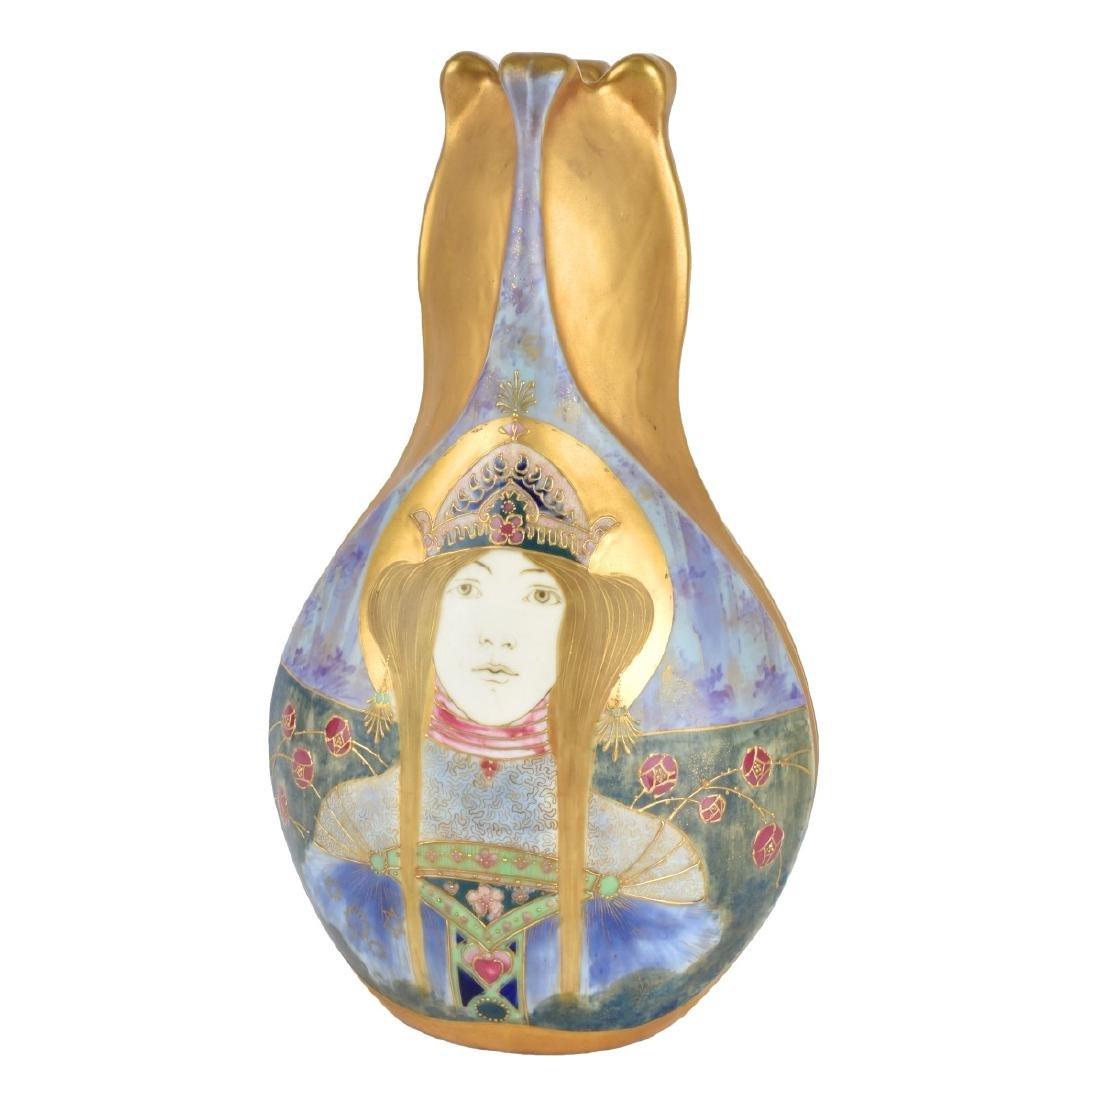 Amphora Turn Teplitz Princess Vase